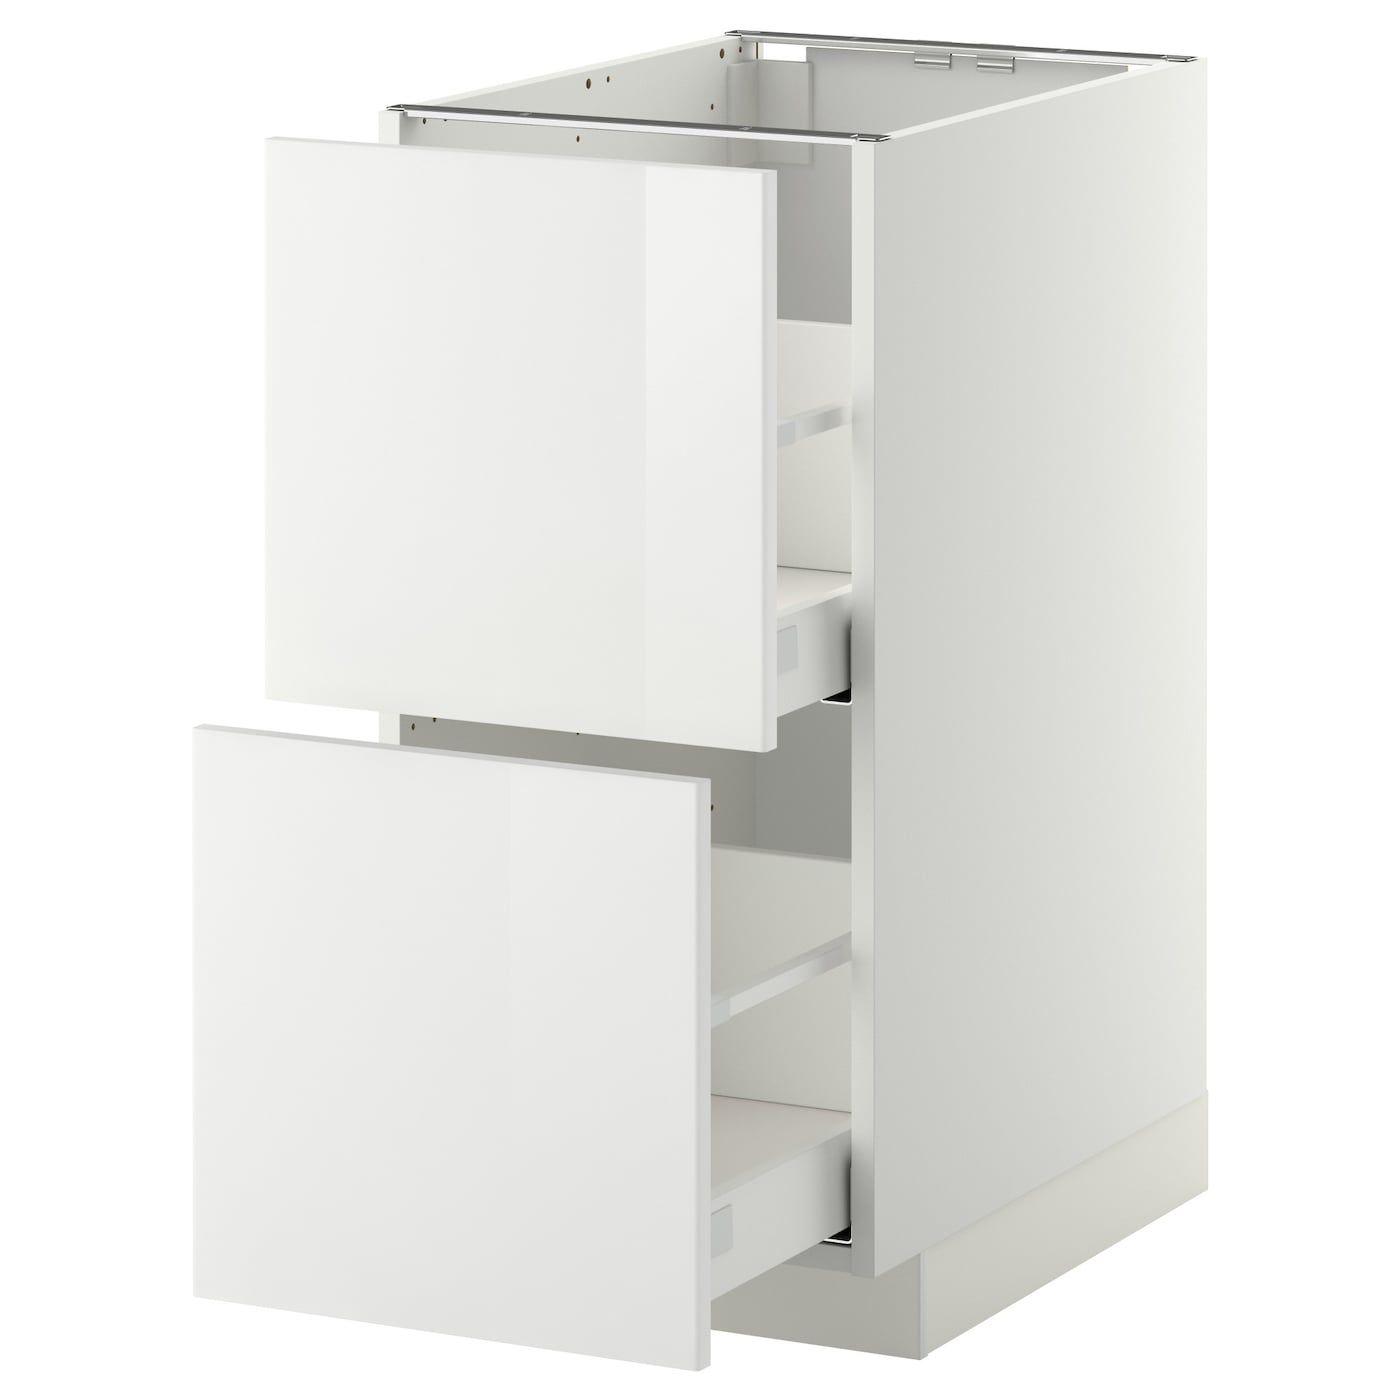 Metod Maximera Onderkast 2 Fronten 2 Hoge Lades In 2020 Ikea